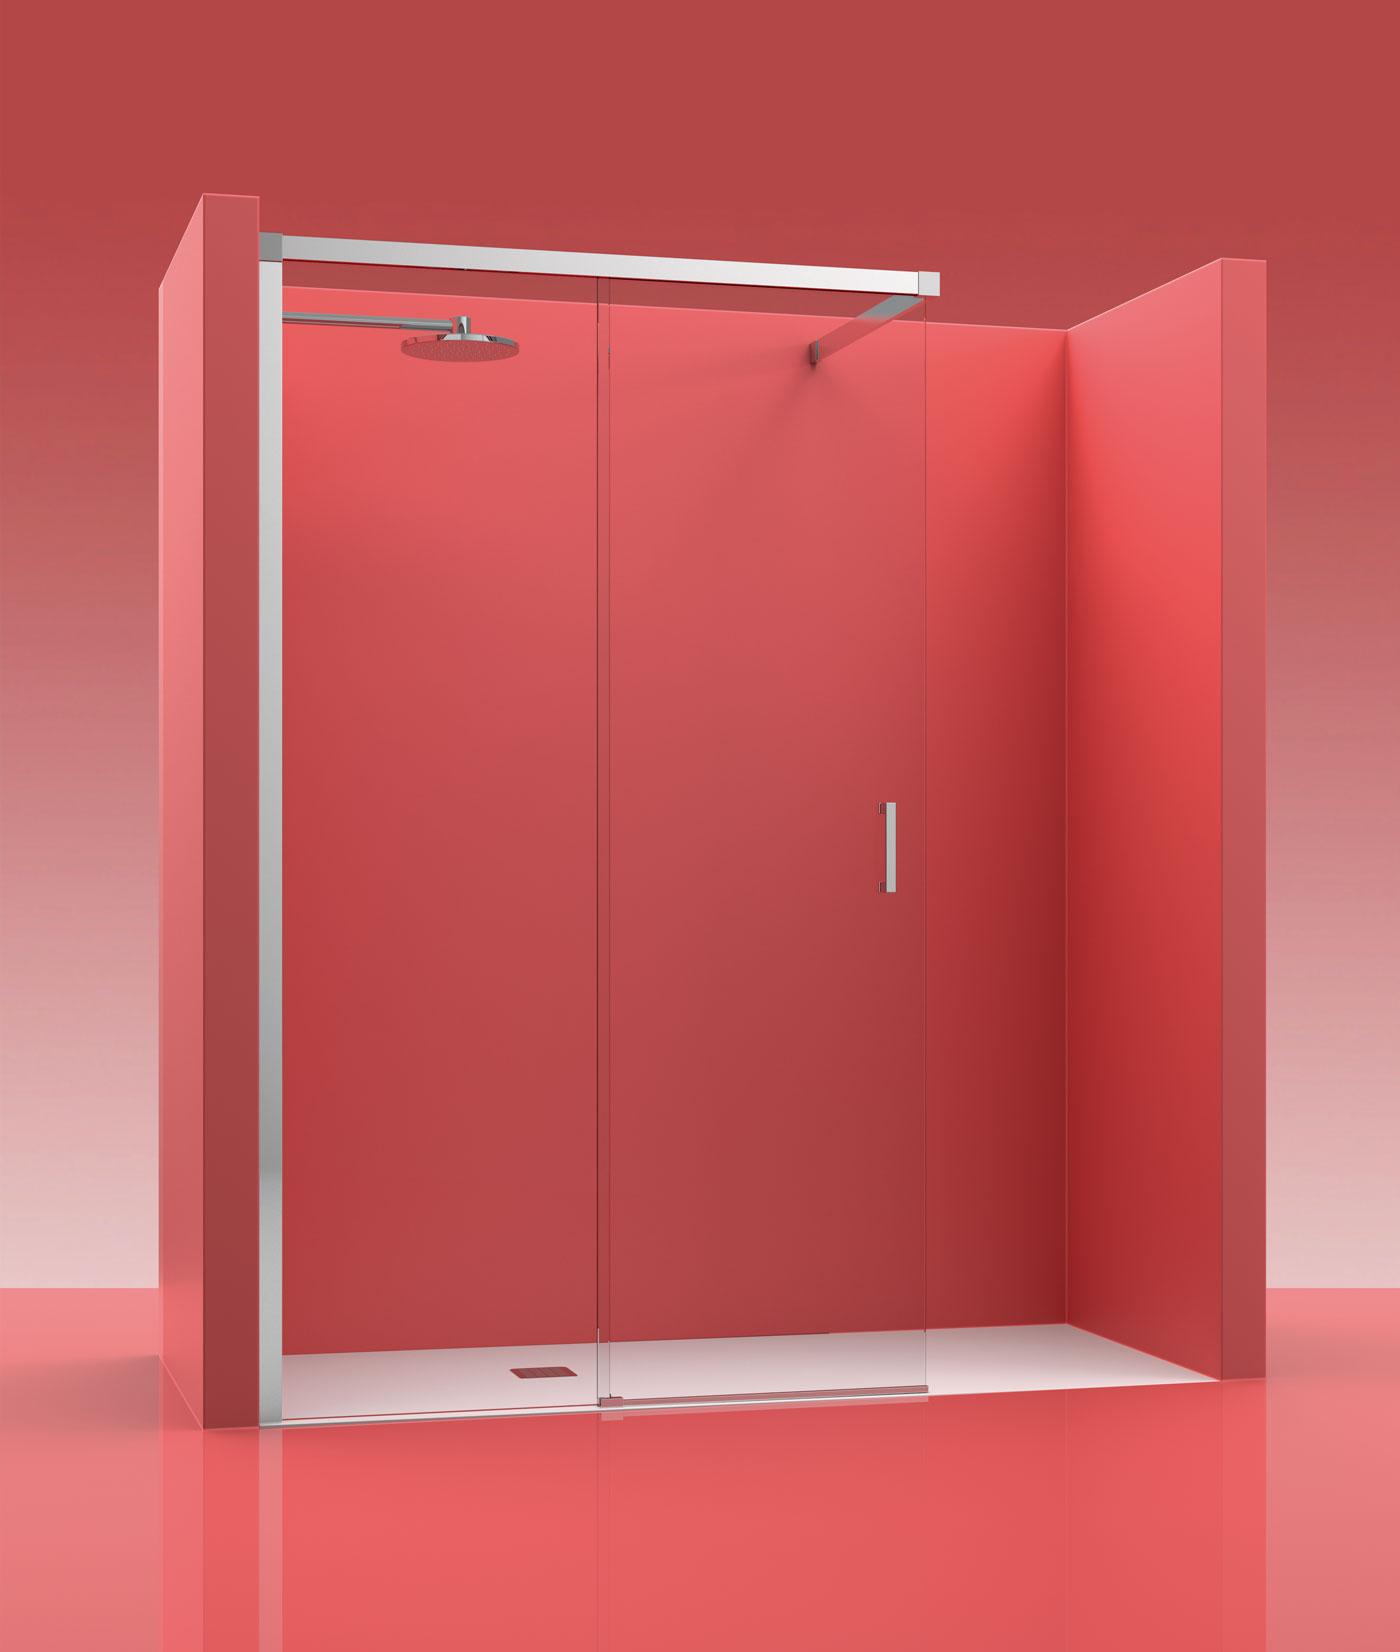 Mamparas de ducha online good mamparas abatibles - Mamparas ducha online ...